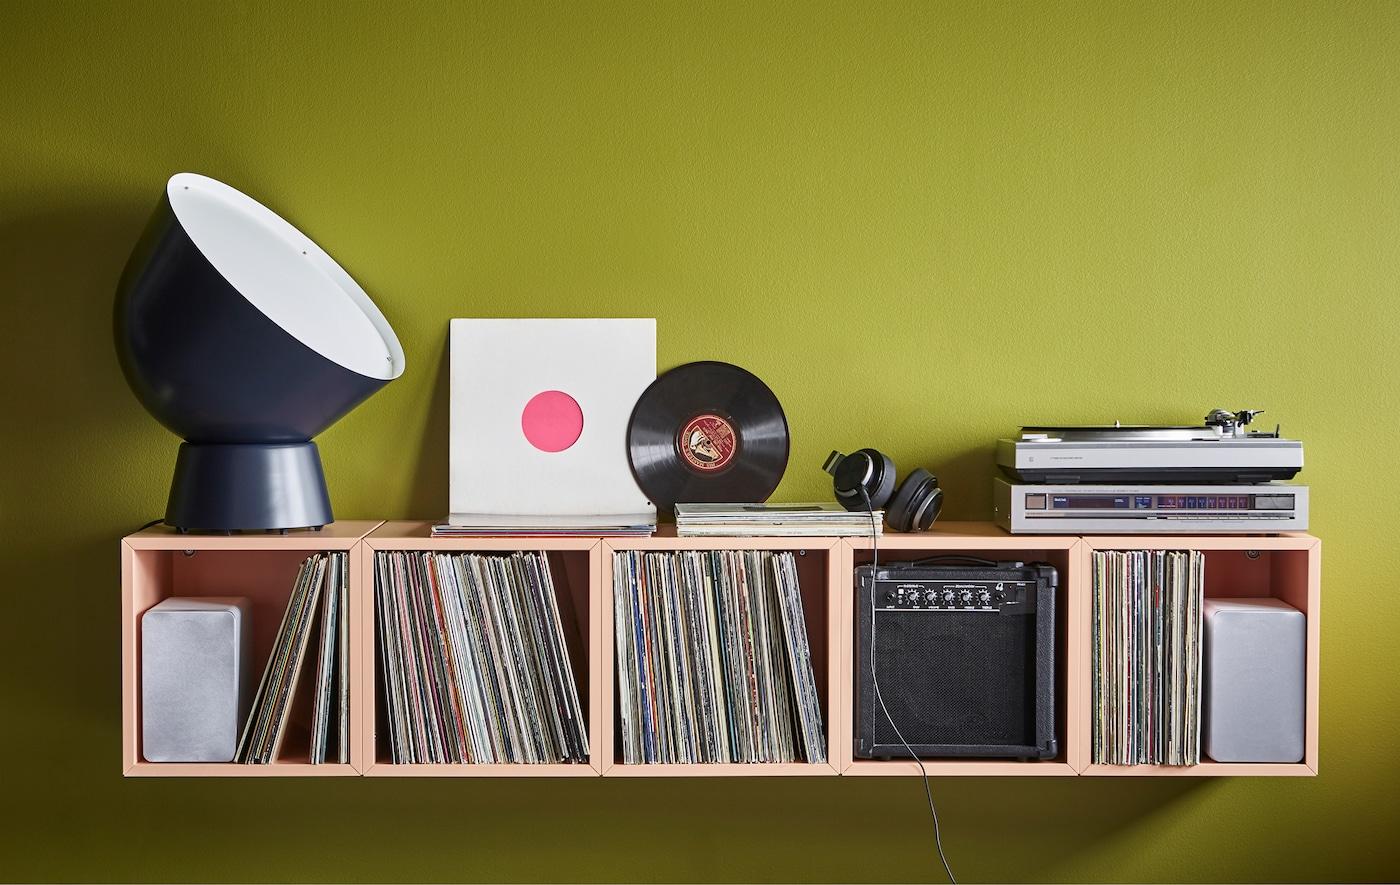 A home DJ-station uses EKET cabinets in light orange for record storage.